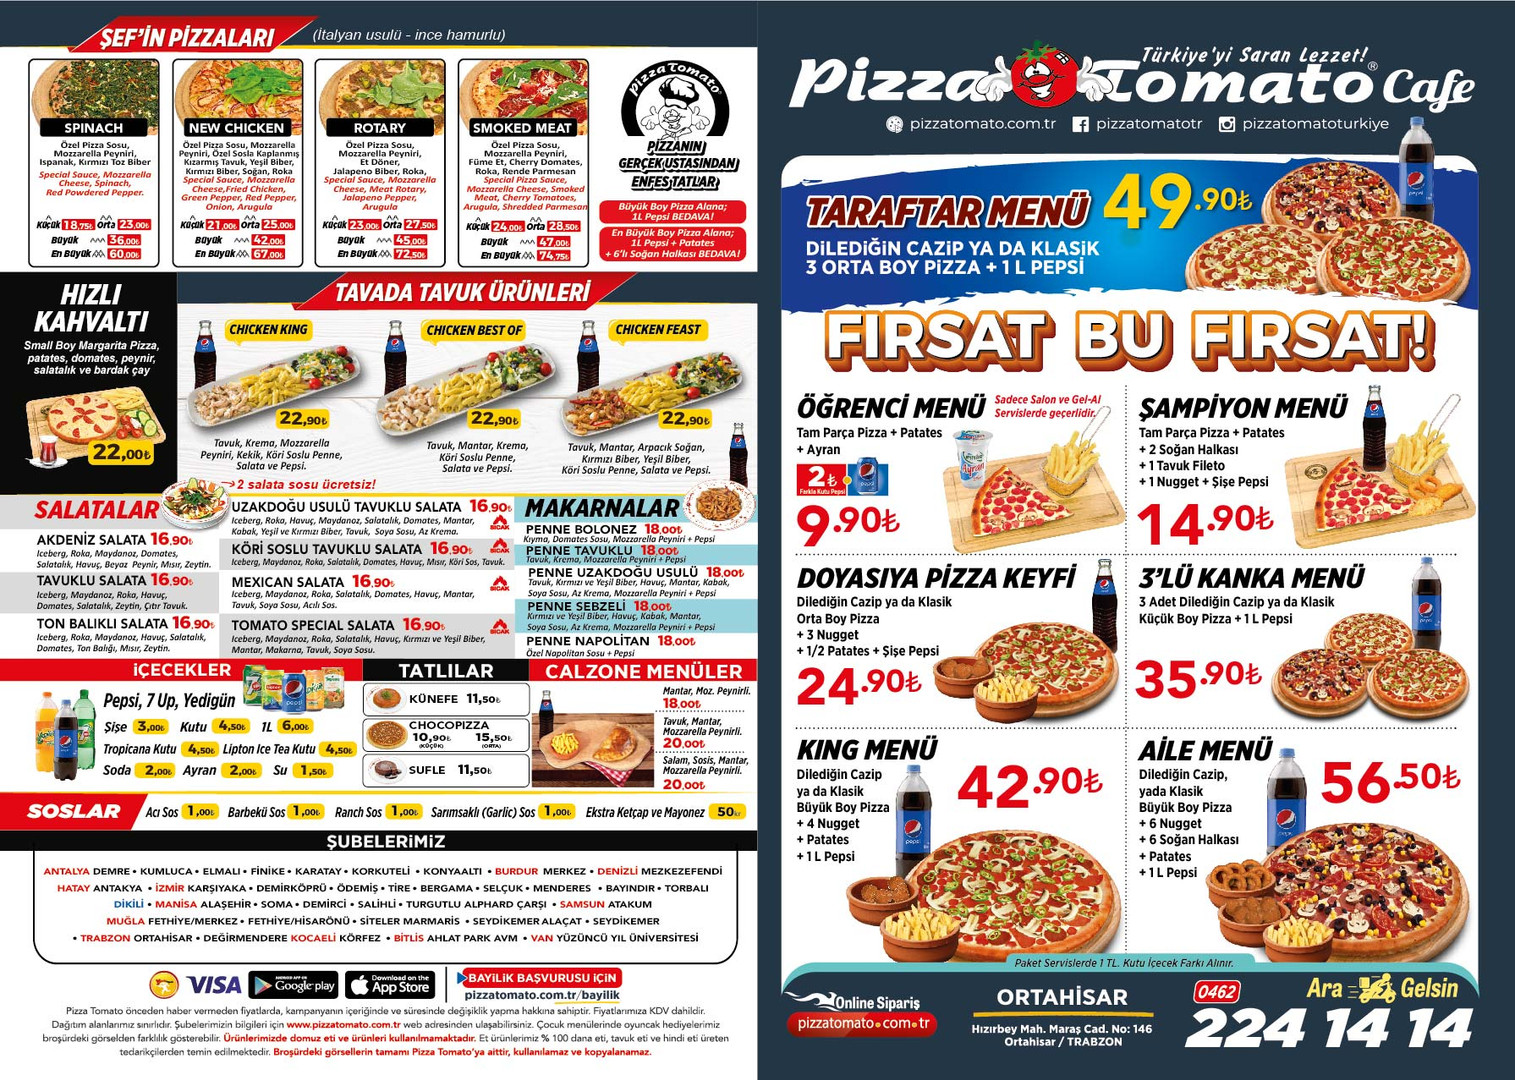 Pizza Tomato ortahisar menu on sayfa.jpg